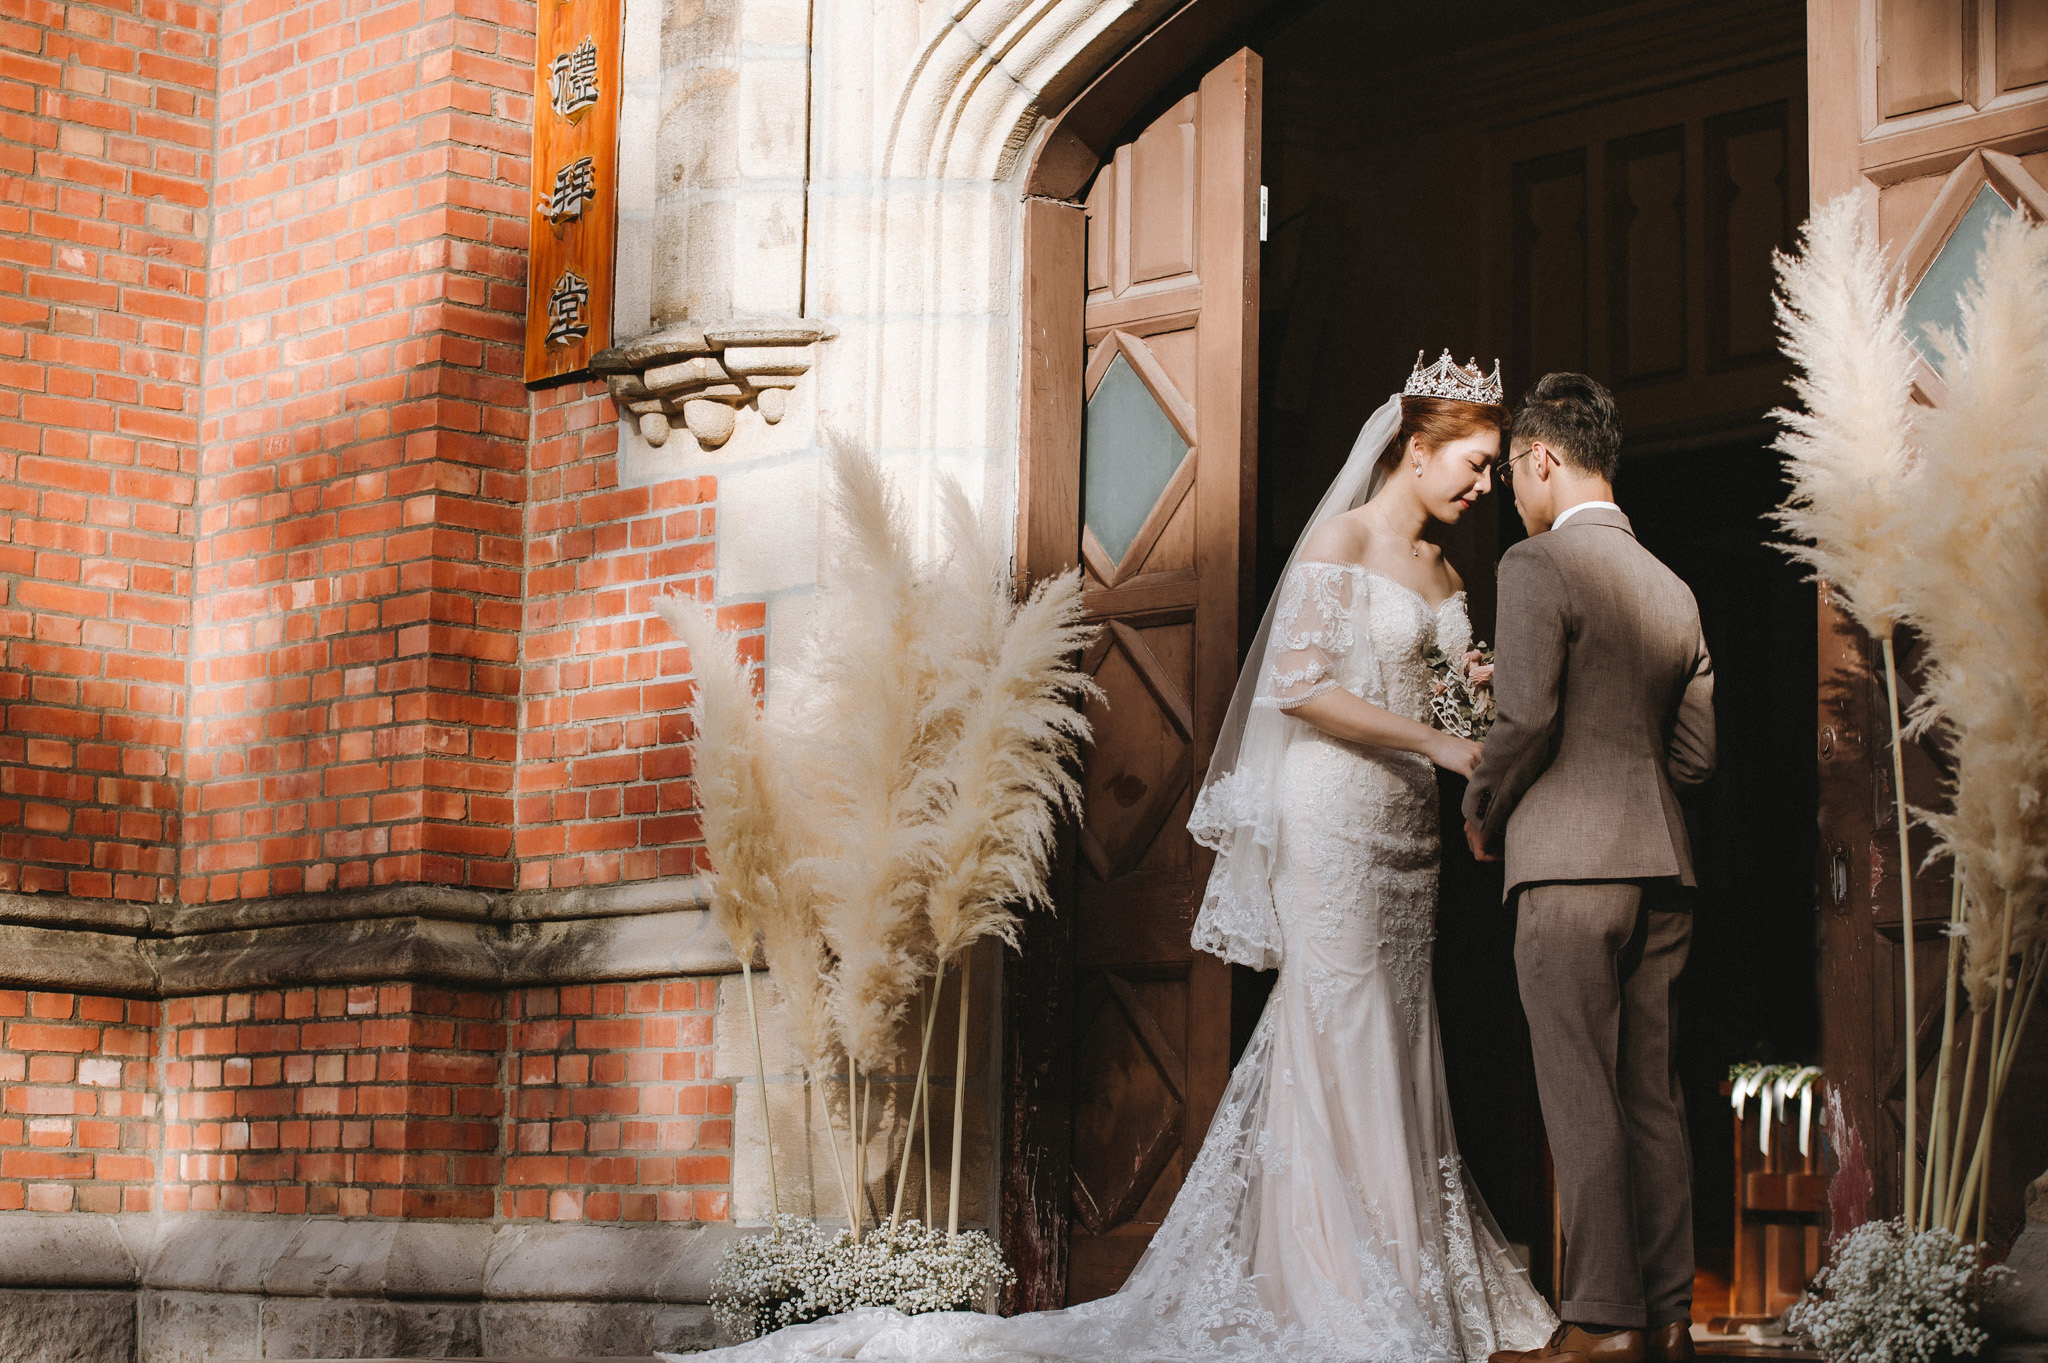 EW 台北婚攝 居米 濟南教會 Brick Yard 33 美軍俱樂部 婚禮 婚宴-1